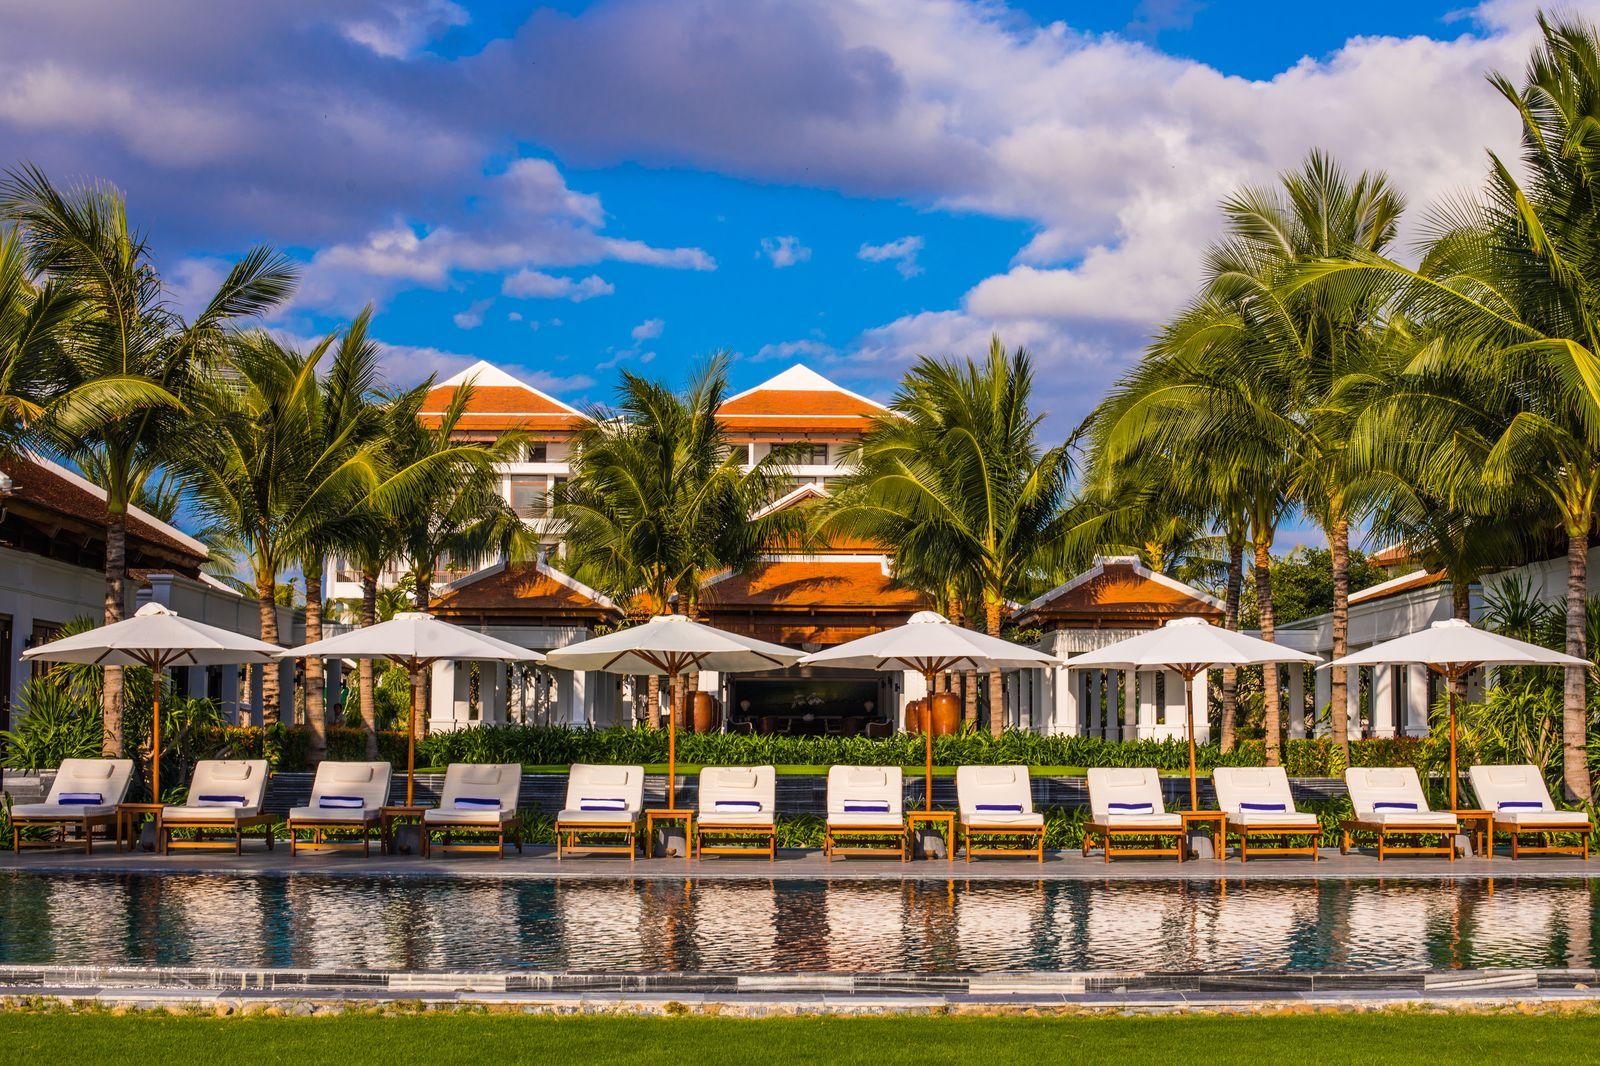 Vietnam Nha Hotels Love In Trang